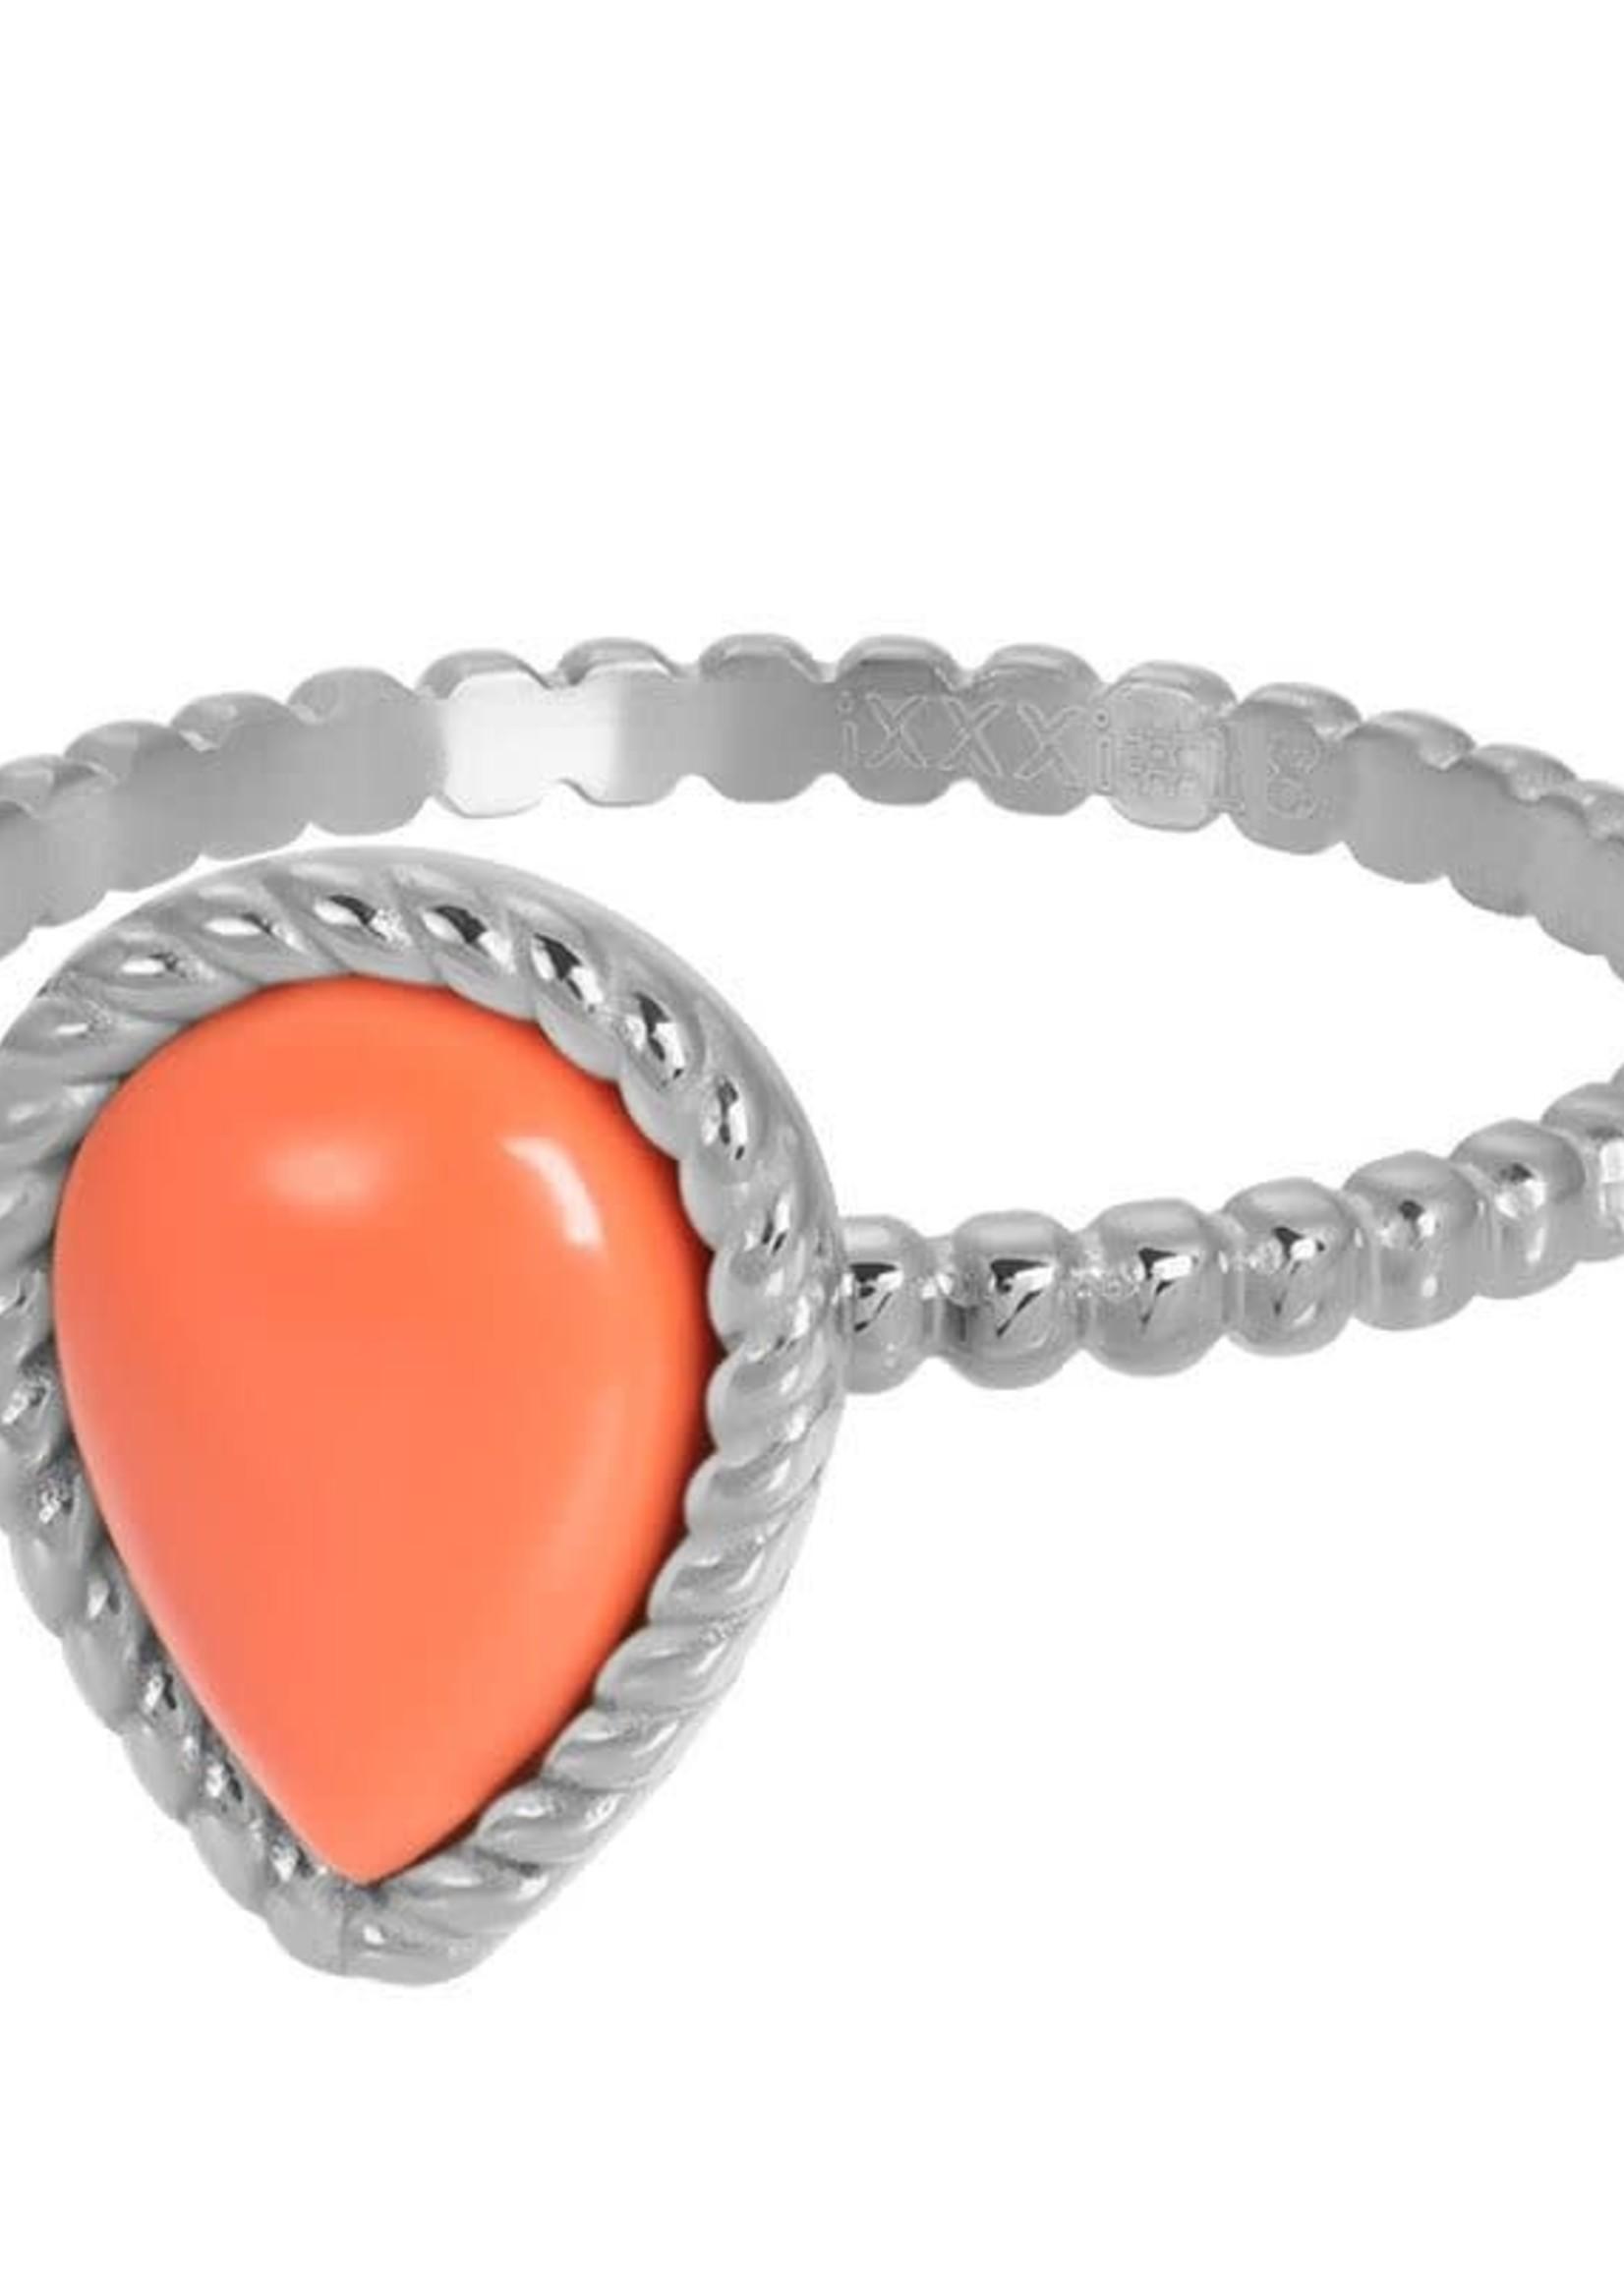 iXXXi Jewelry iXXXi vulring Magic coral - staal